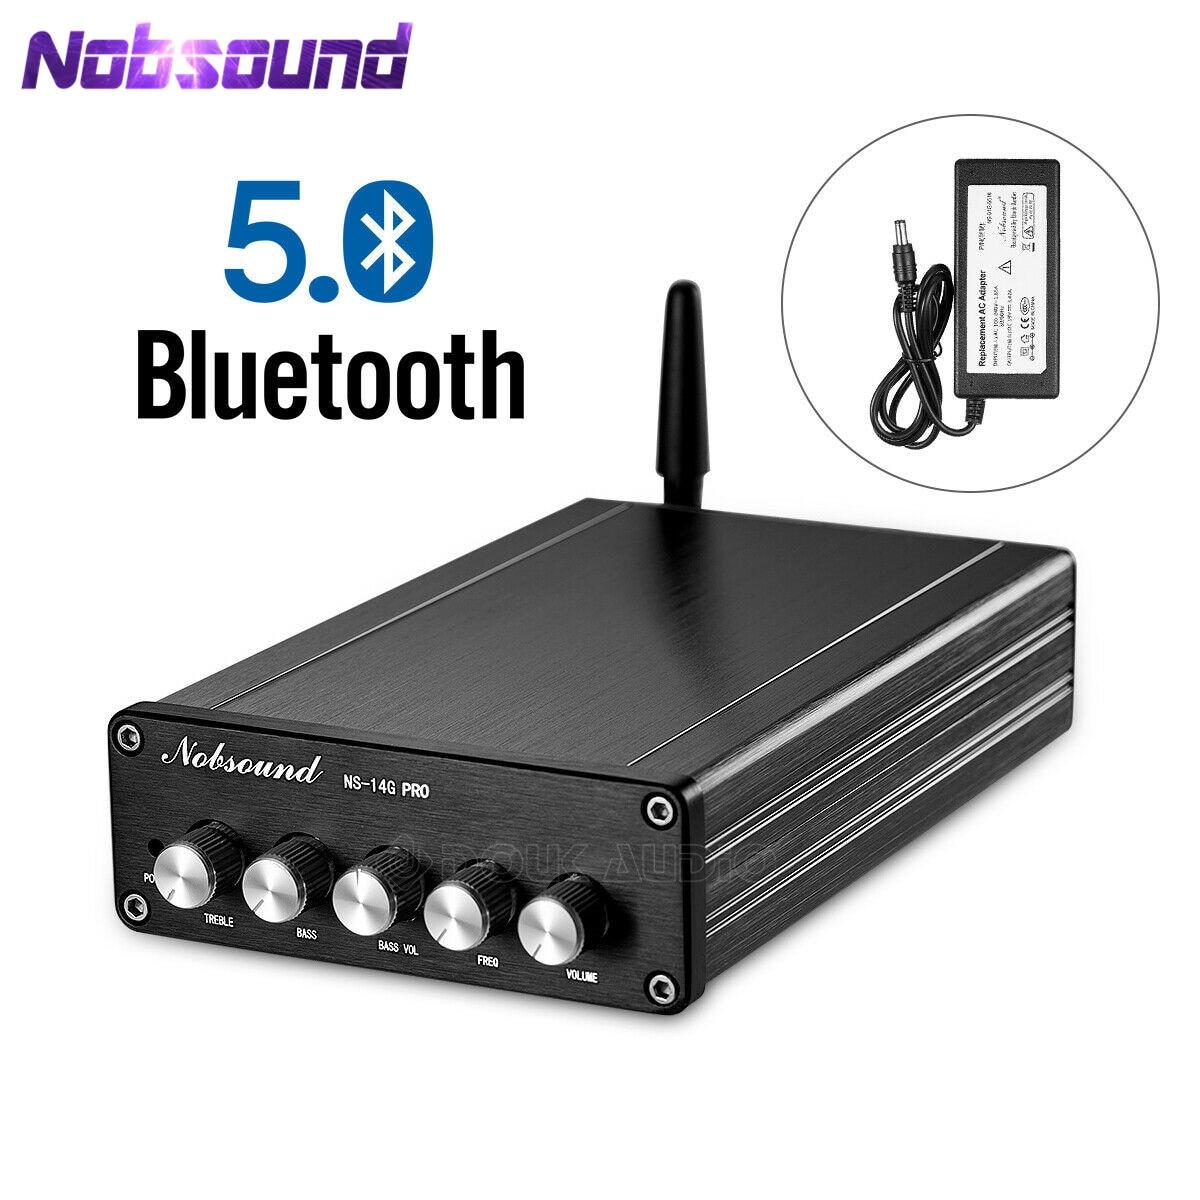 Nobsound Bluetooth 5.0 HiFi TPA3116 Digital Power Audio Amplifier 2.1 Channel Stereo Audio Amp BlackNobsound Bluetooth 5.0 HiFi TPA3116 Digital Power Audio Amplifier 2.1 Channel Stereo Audio Amp Black